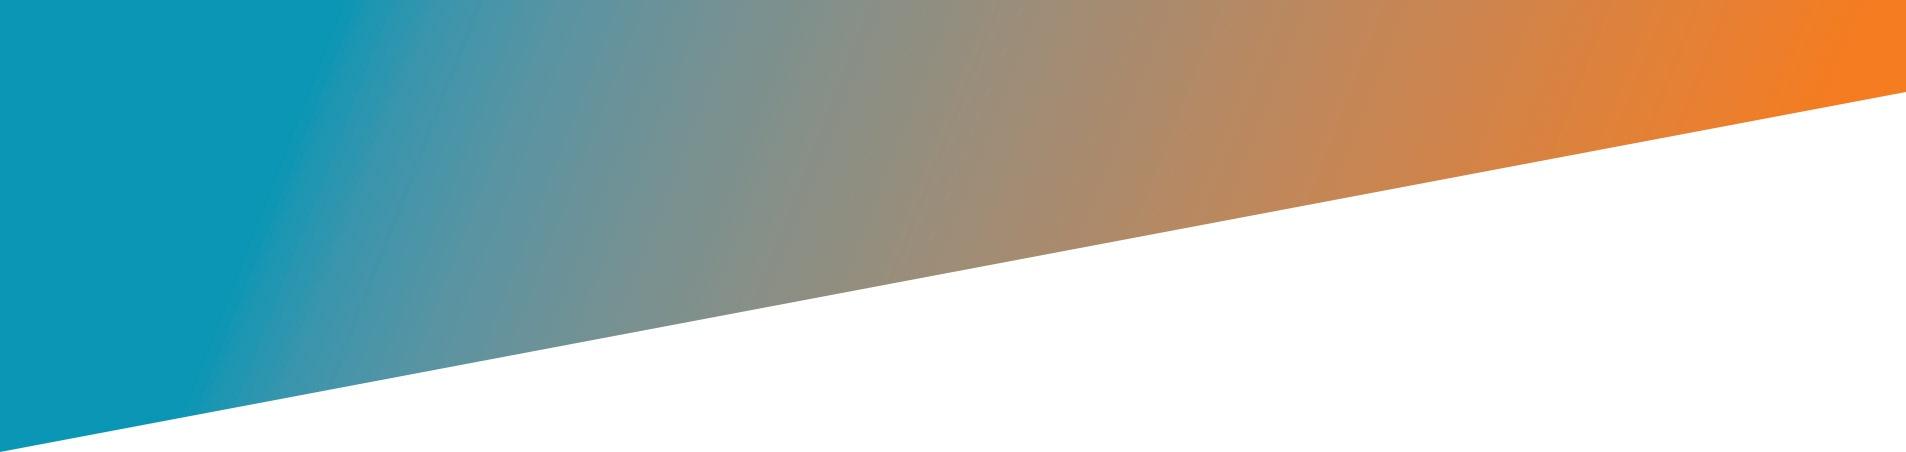 Cognidox-Customer-Success-Page-Header.jpg